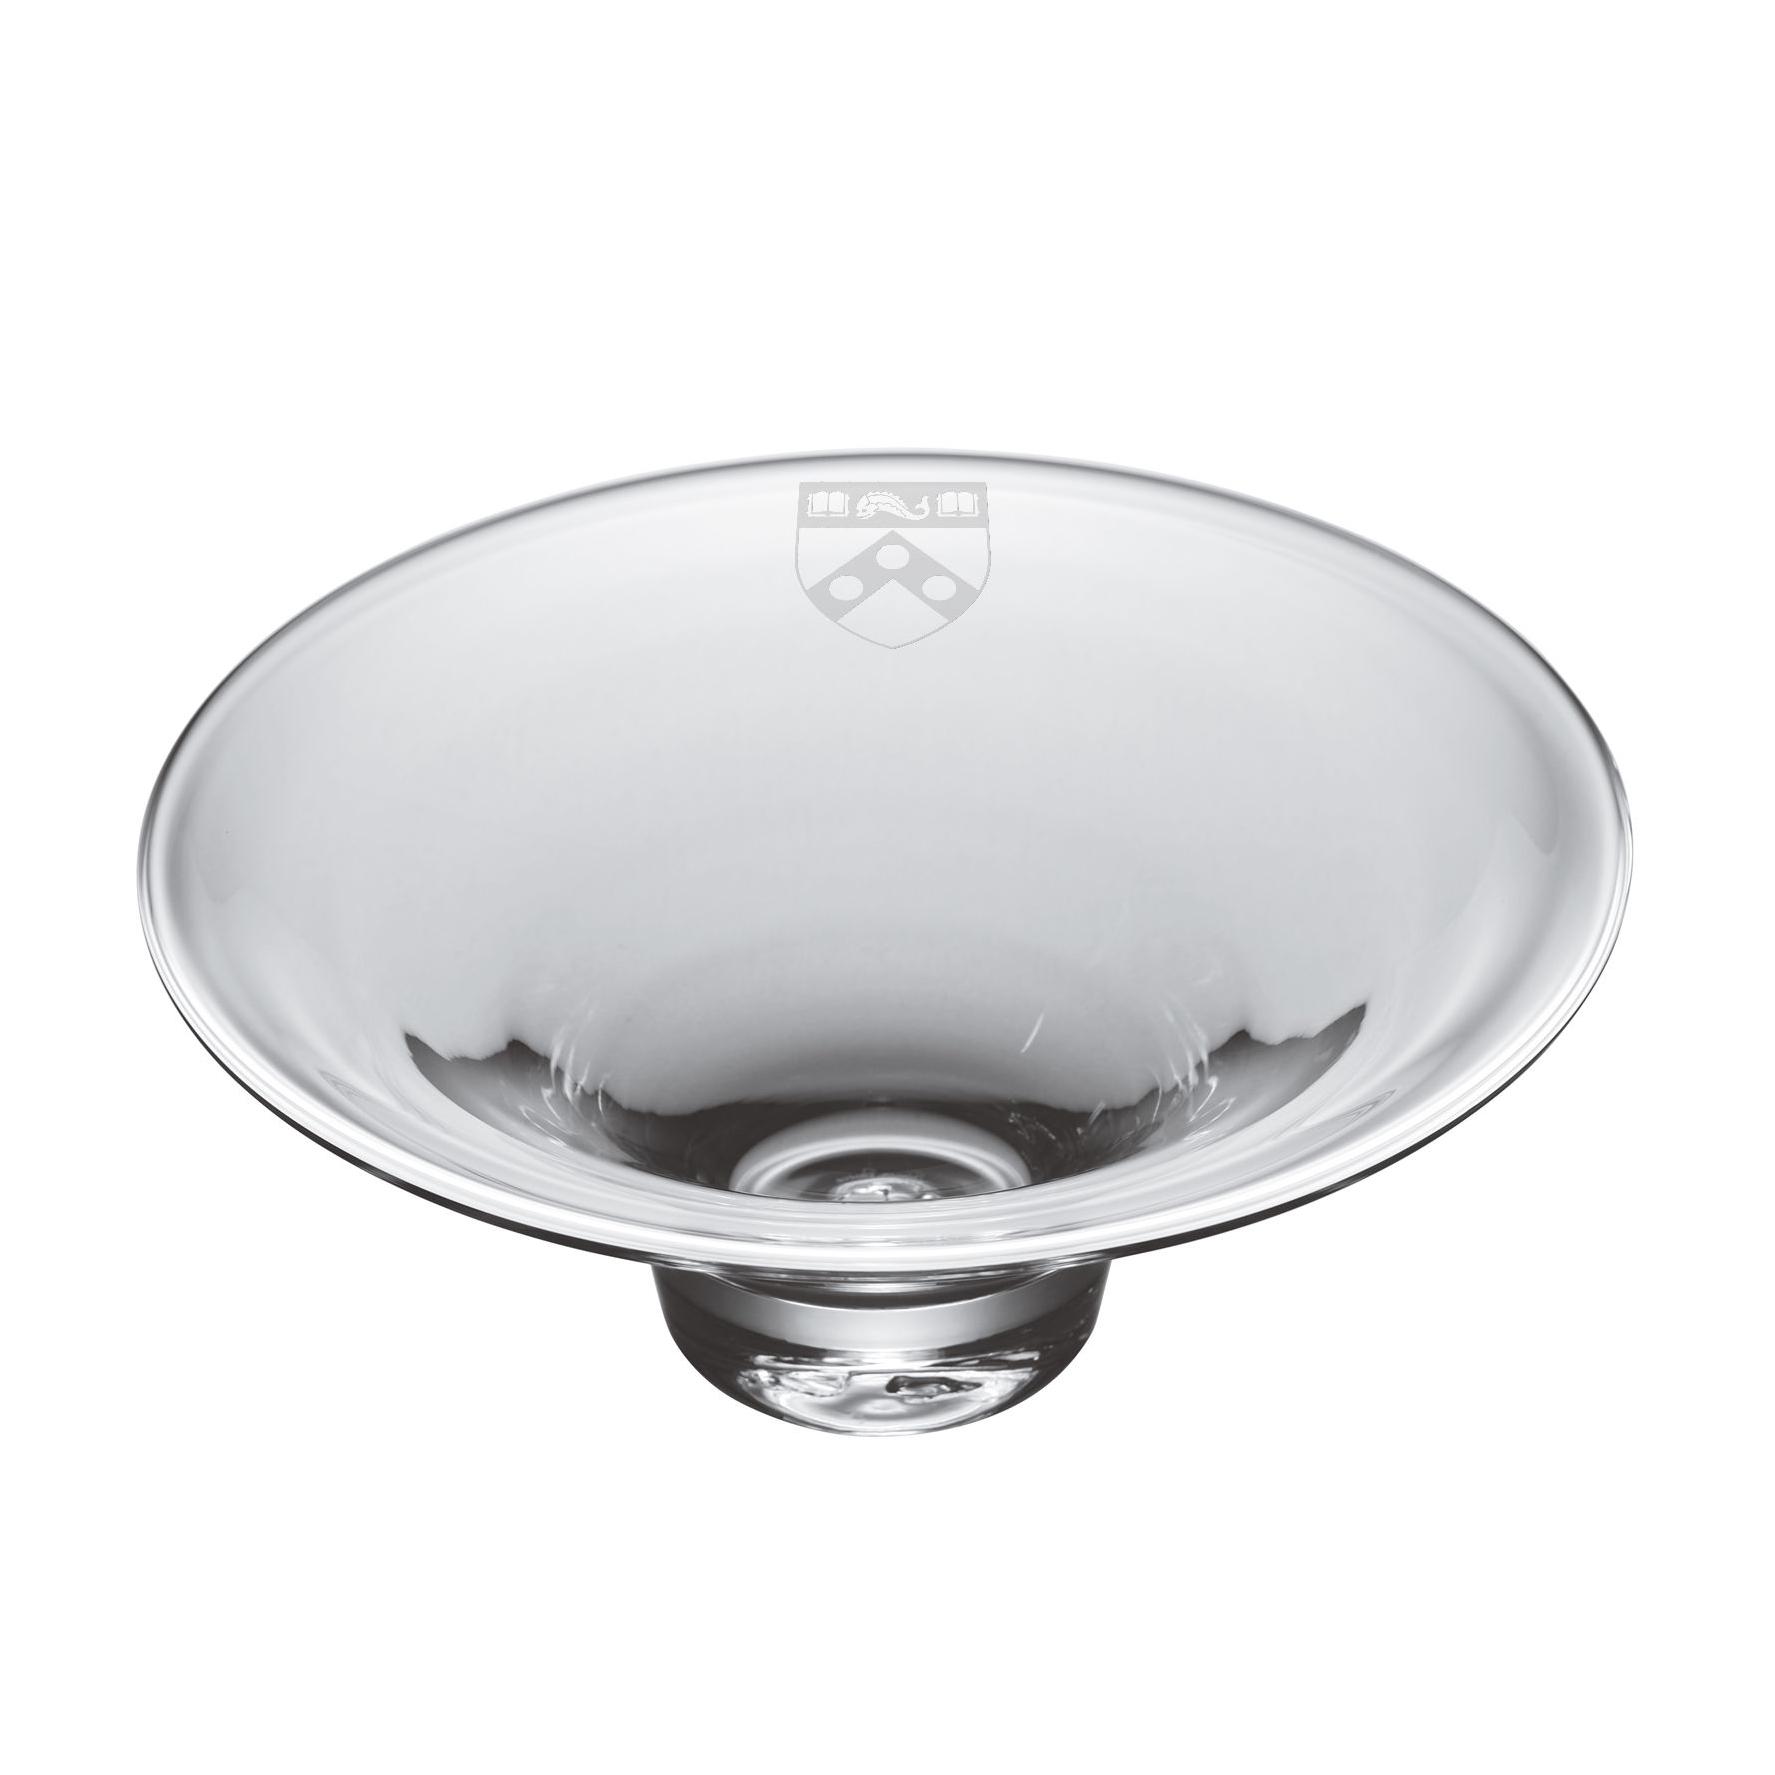 Penn Glass Hanover Bowl by Simon Pearce